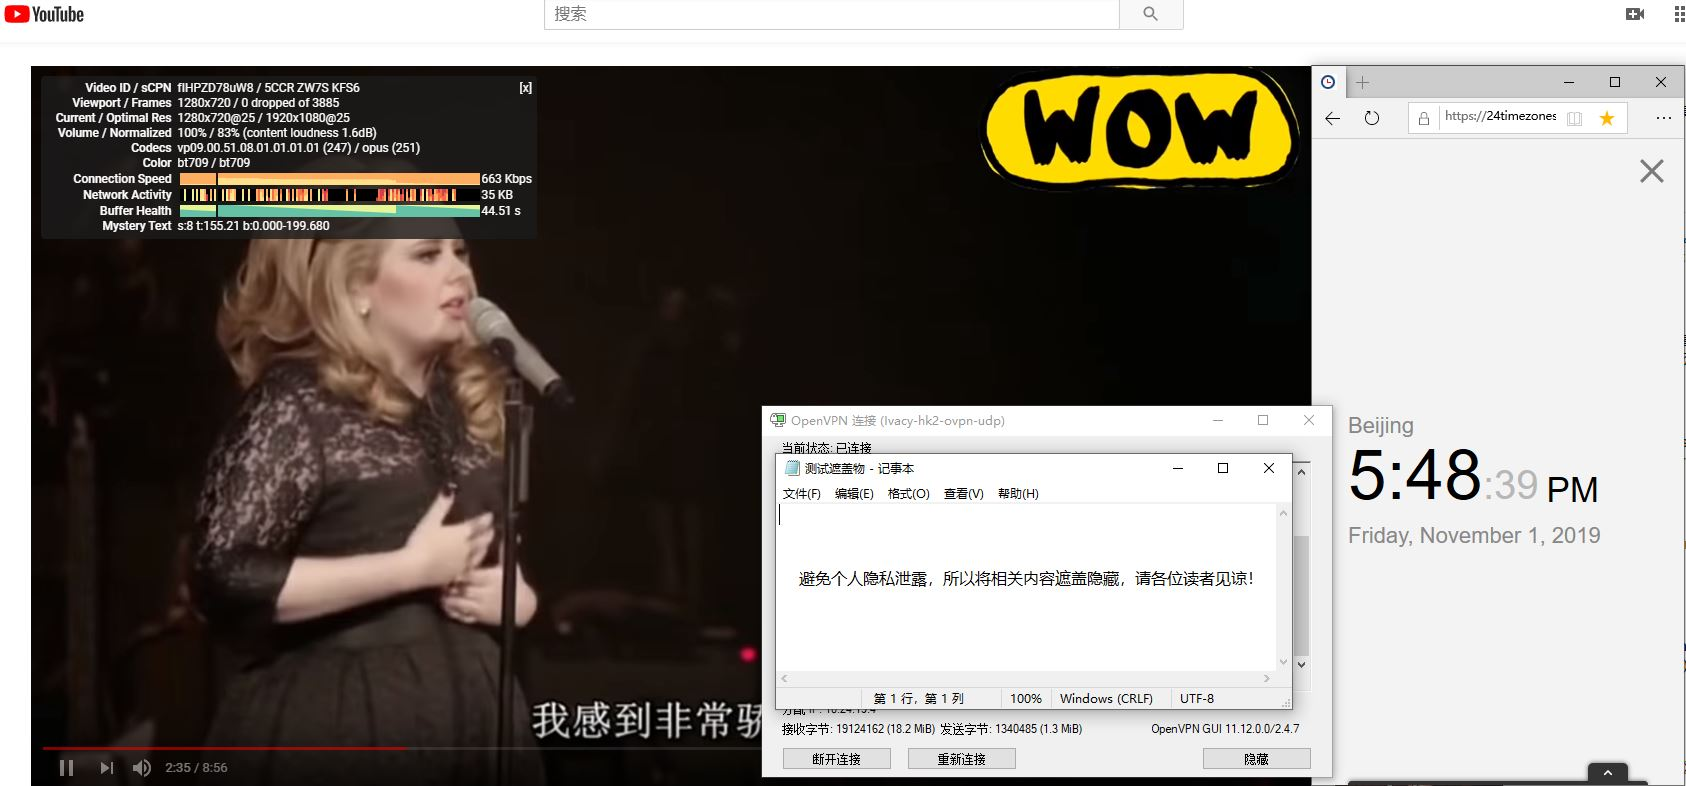 Windows IvacyVPN HK-2 中国VPN翻墙软件 科学上网 Youtube链接速度 - 20191101